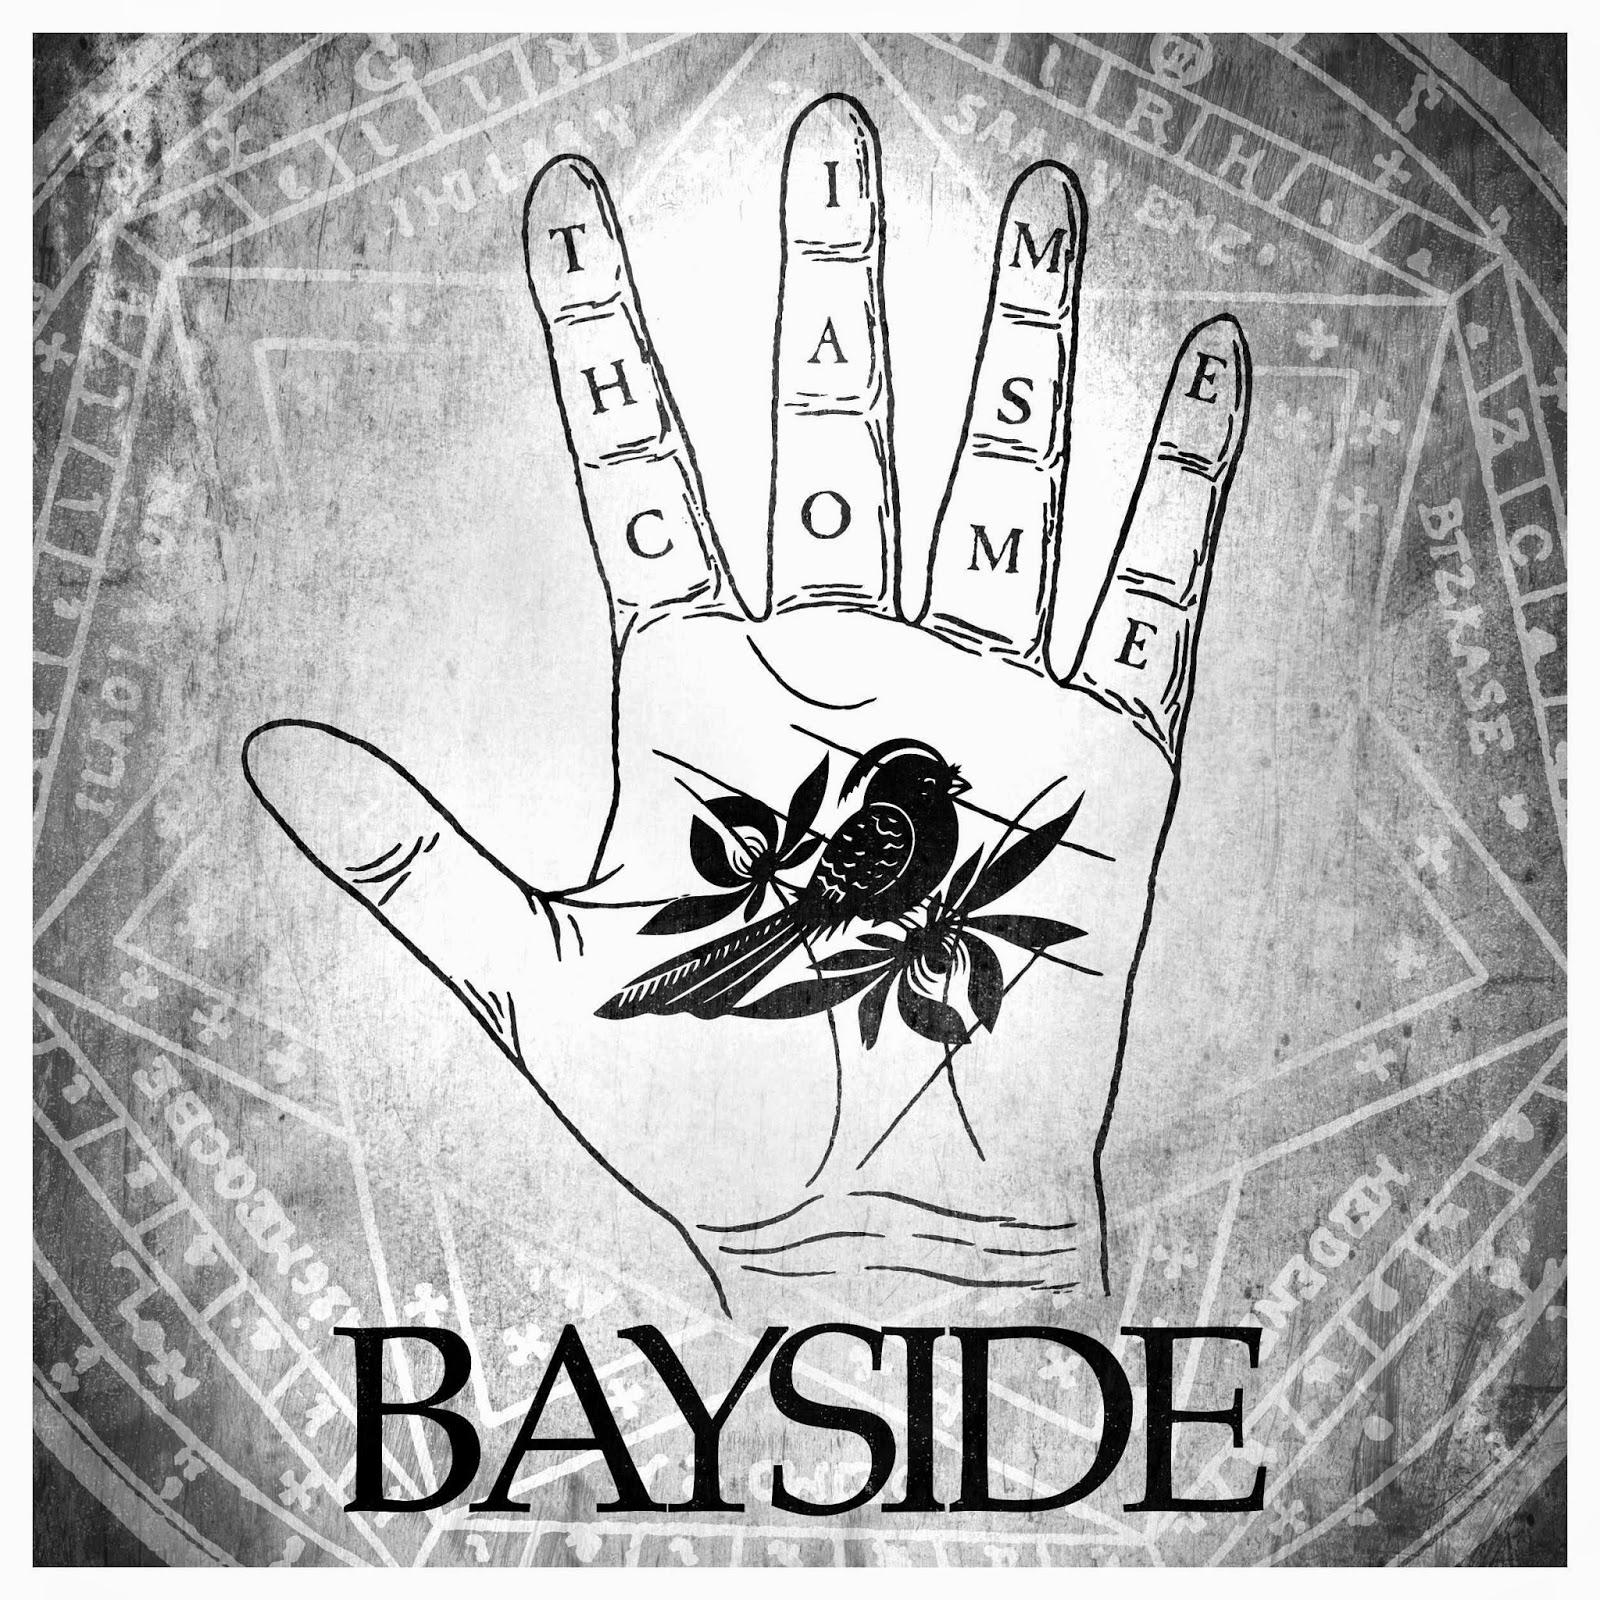 Bayside time has e